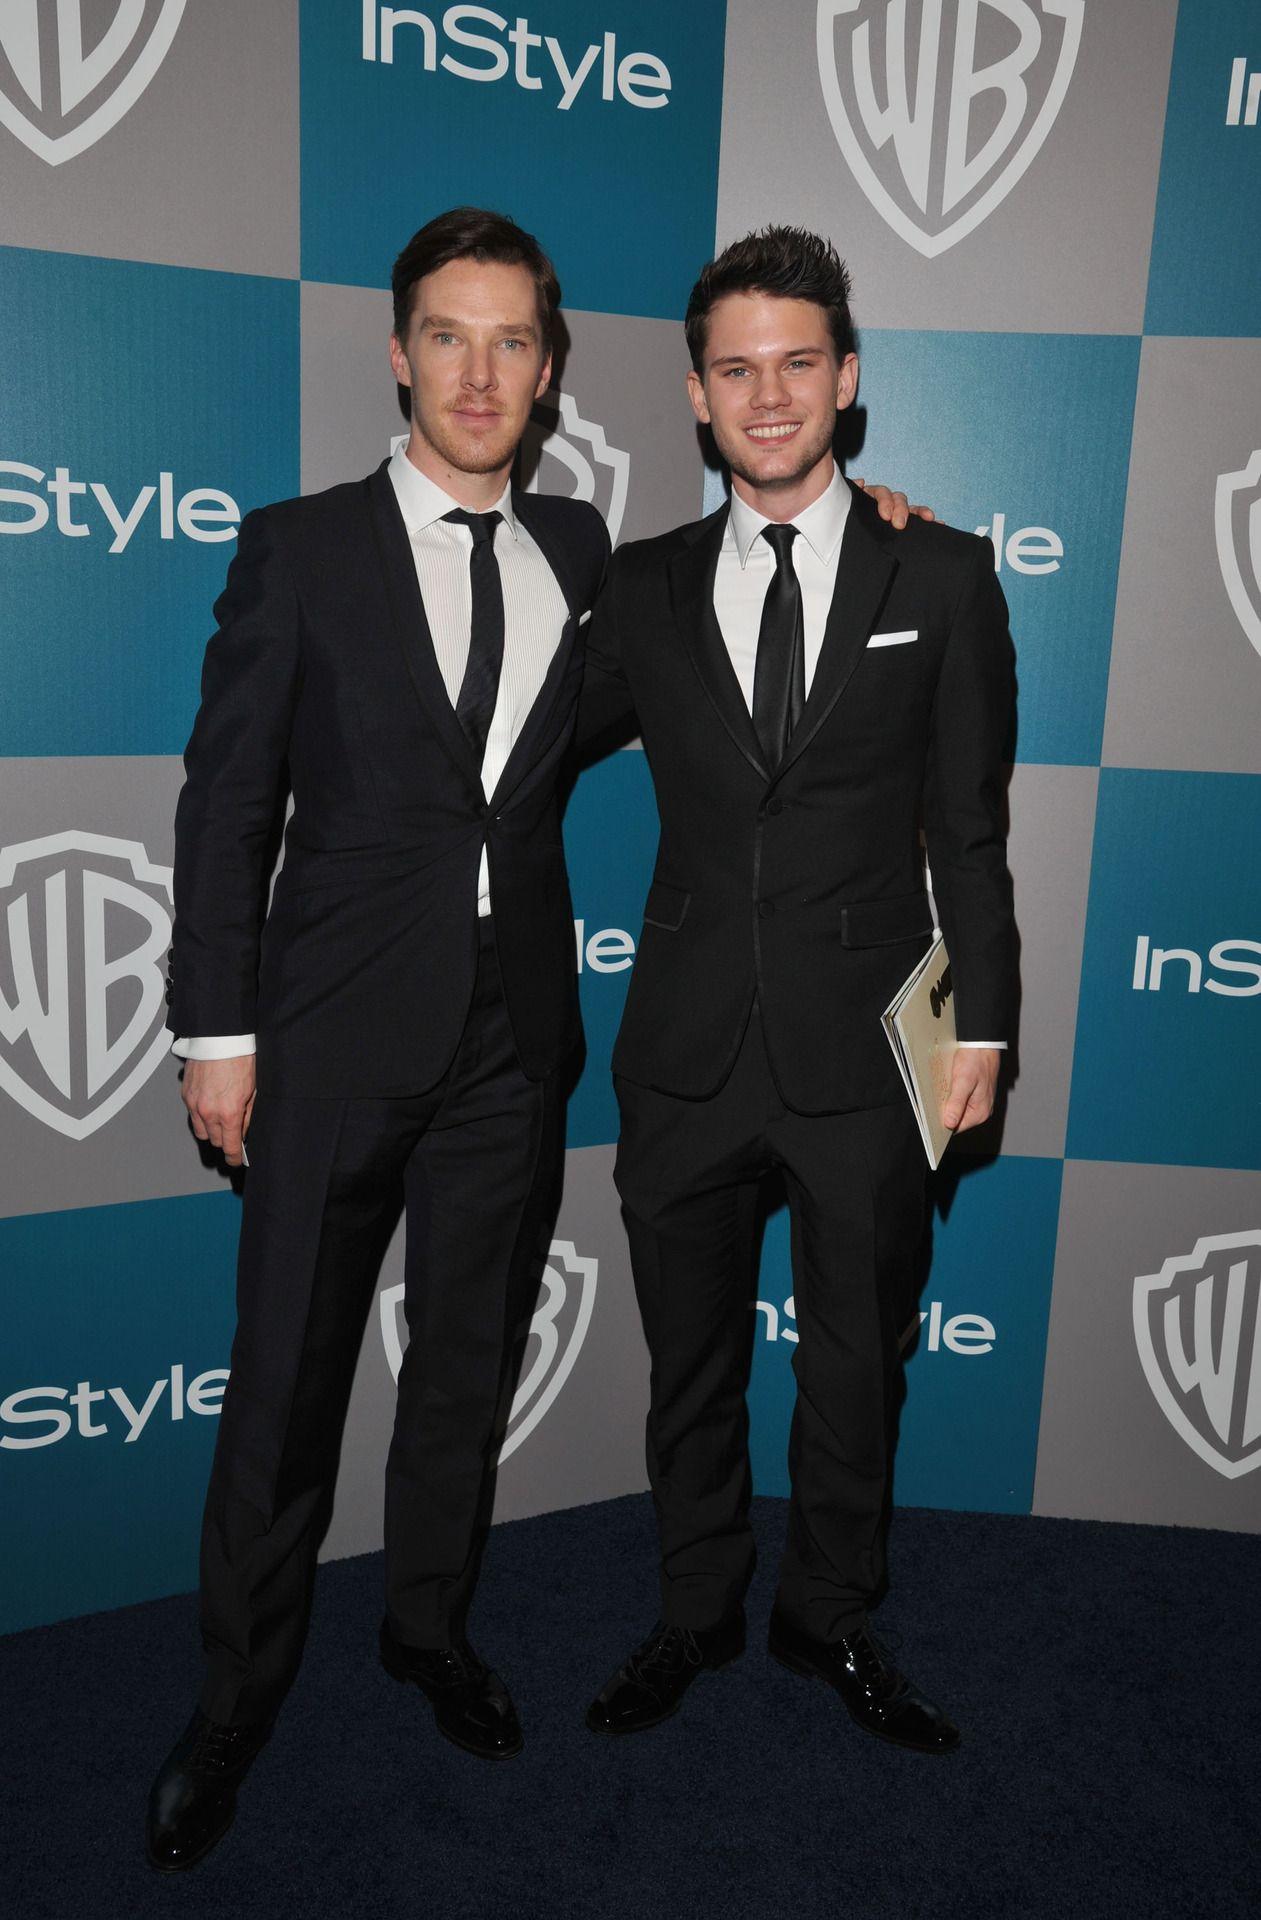 Benedict Cumberbatch and Jeremy Irvine